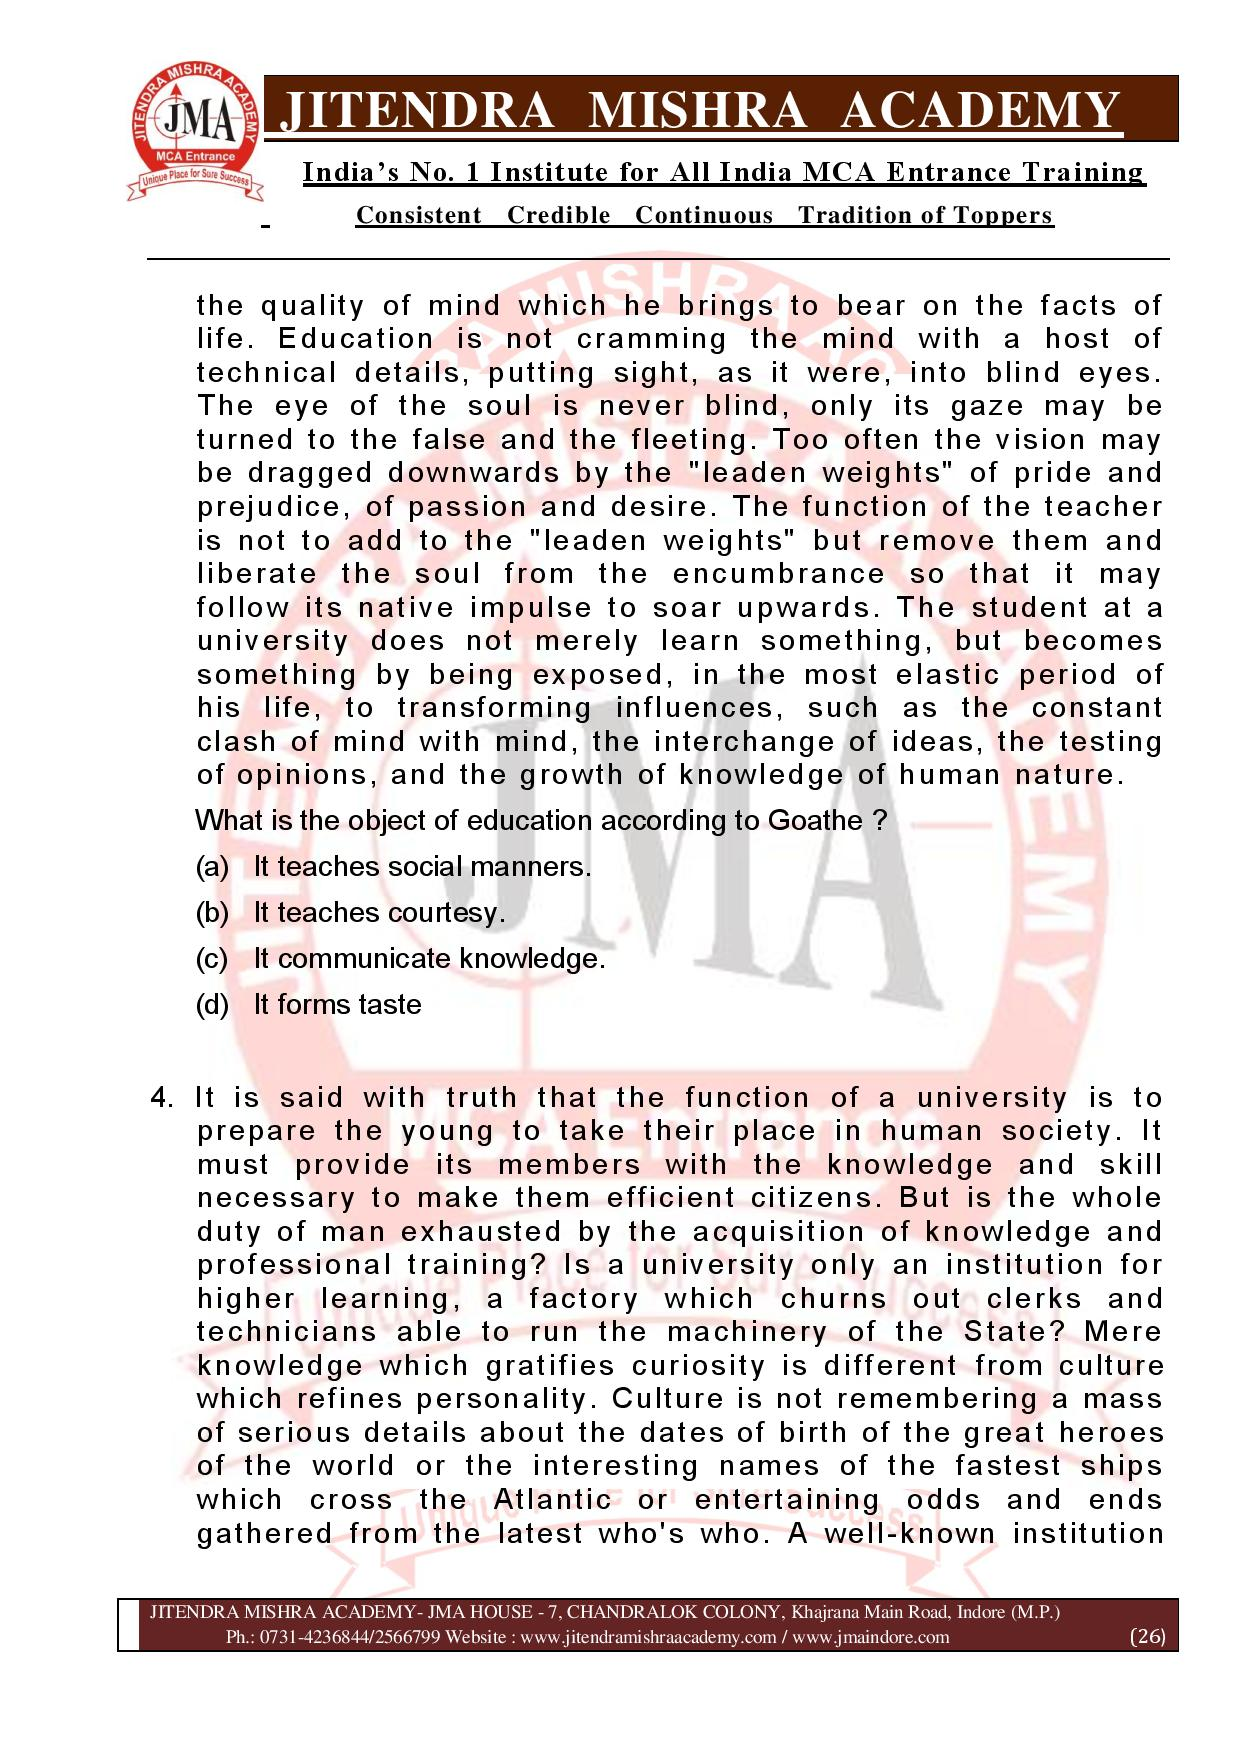 NIMCET 2021 QUESTION PAPER (F)-page-026